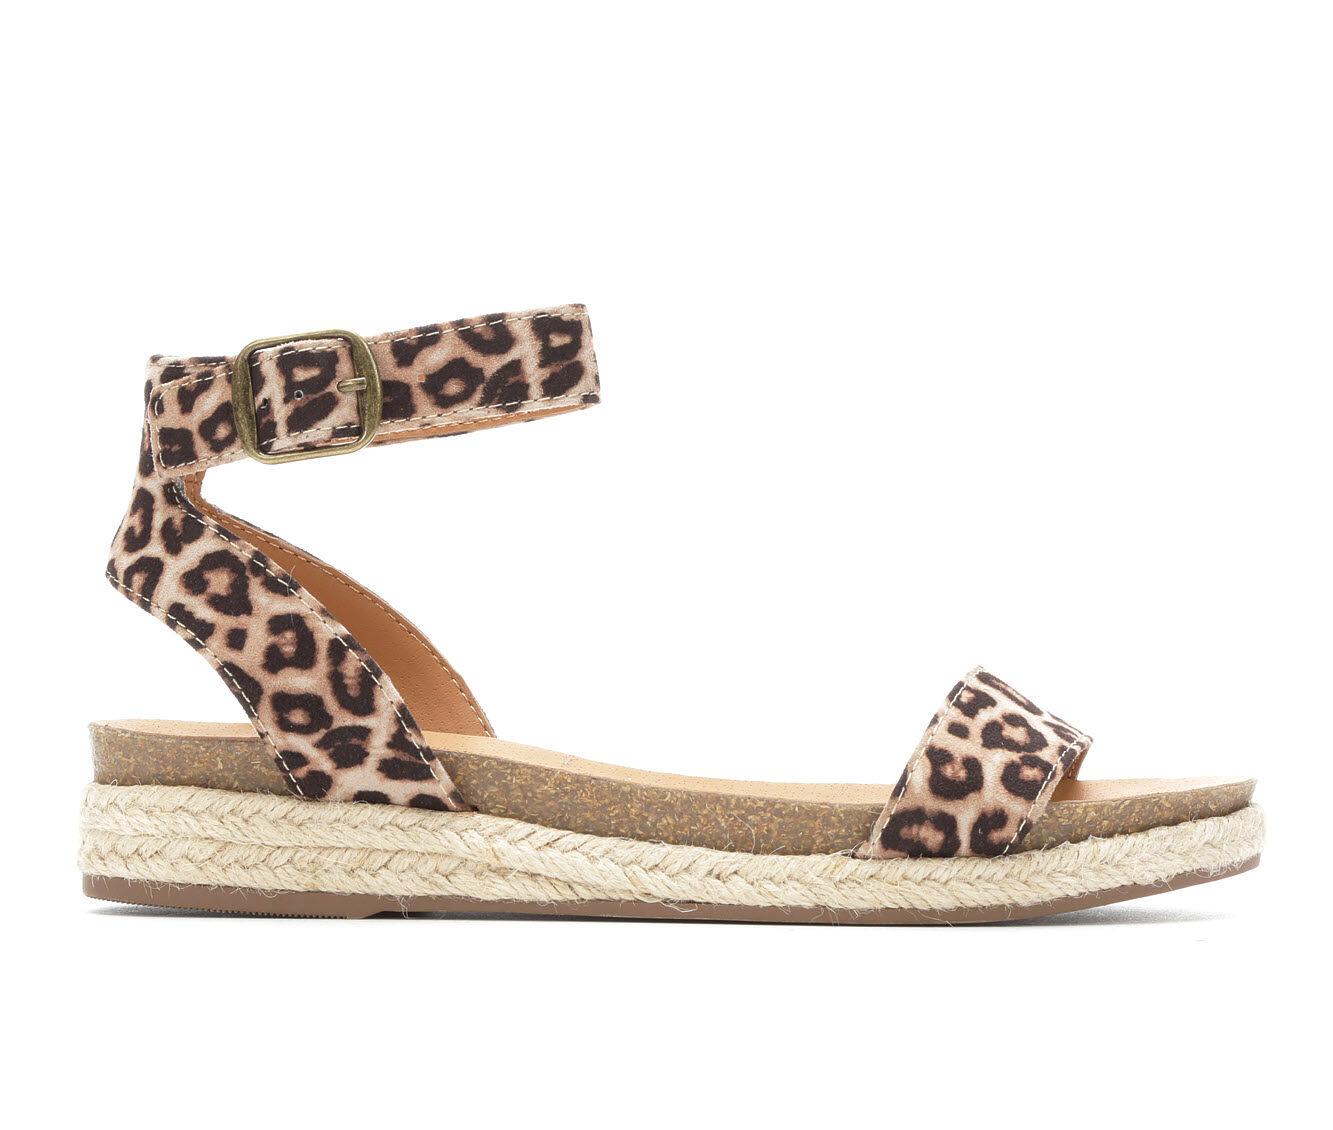 Women's City Classified Tacoma Flatform Sandals Oatmeal Cheetah